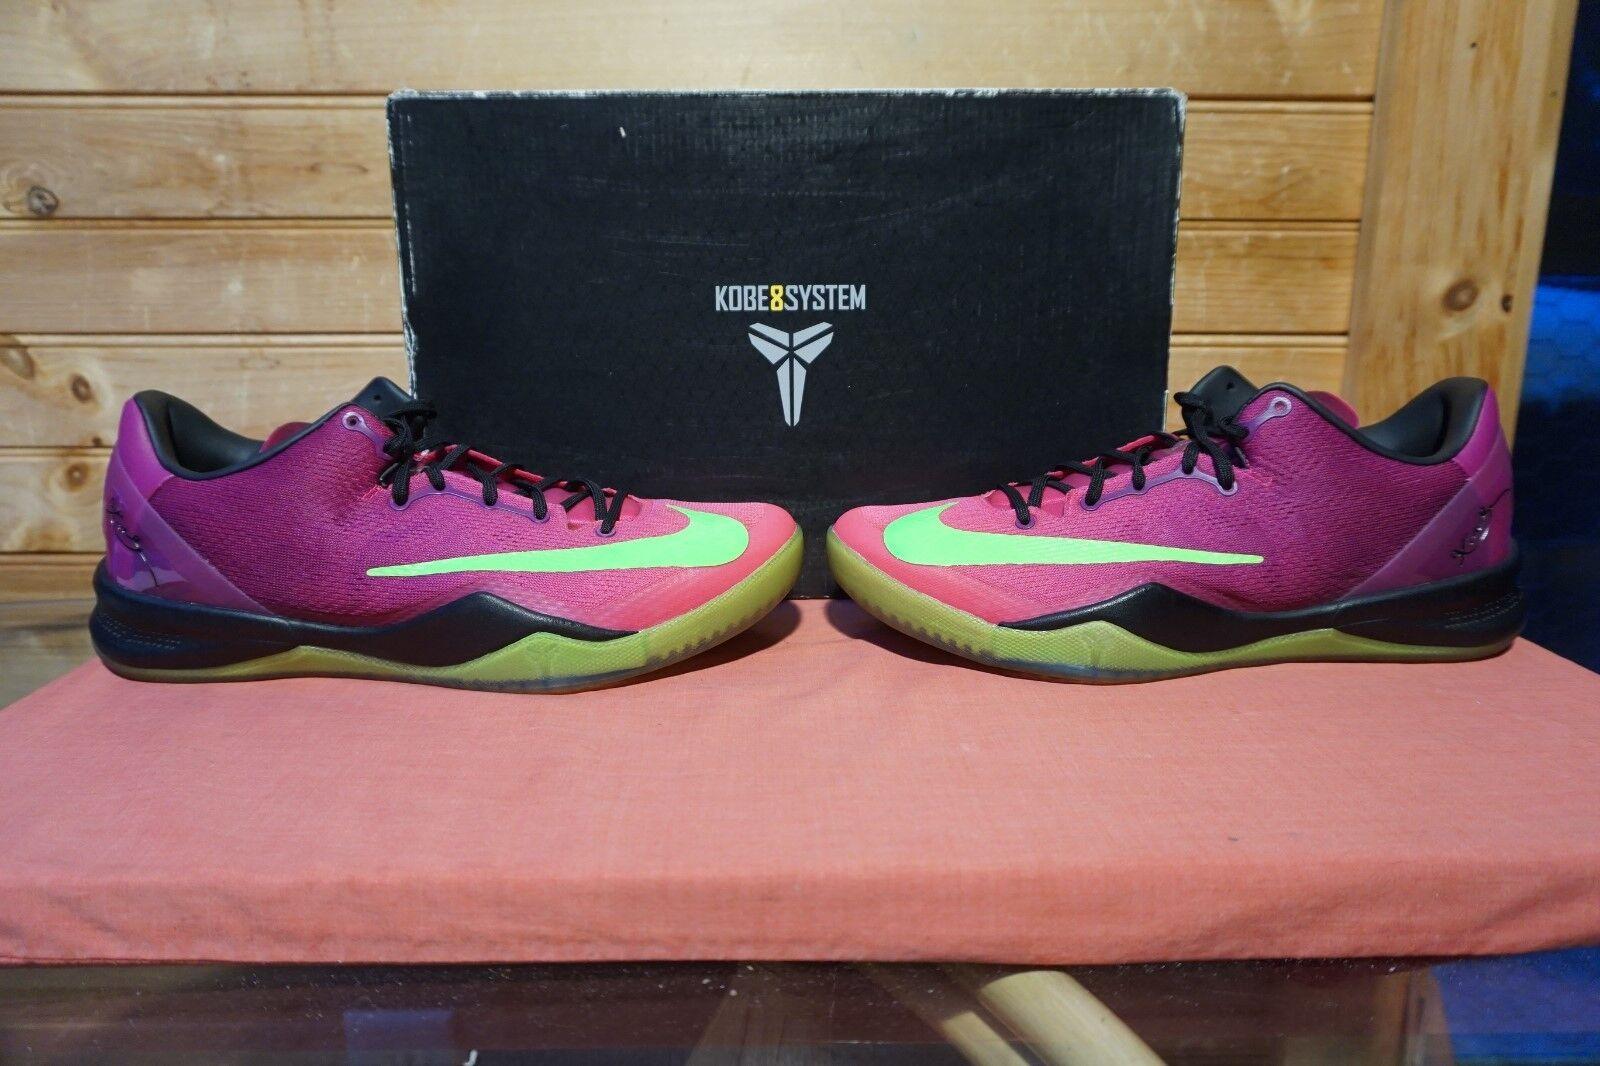 e2a70479991e 2013 Nike Kobe 8 System System System MC Mambacurial Sz 10 (0708) 615315-